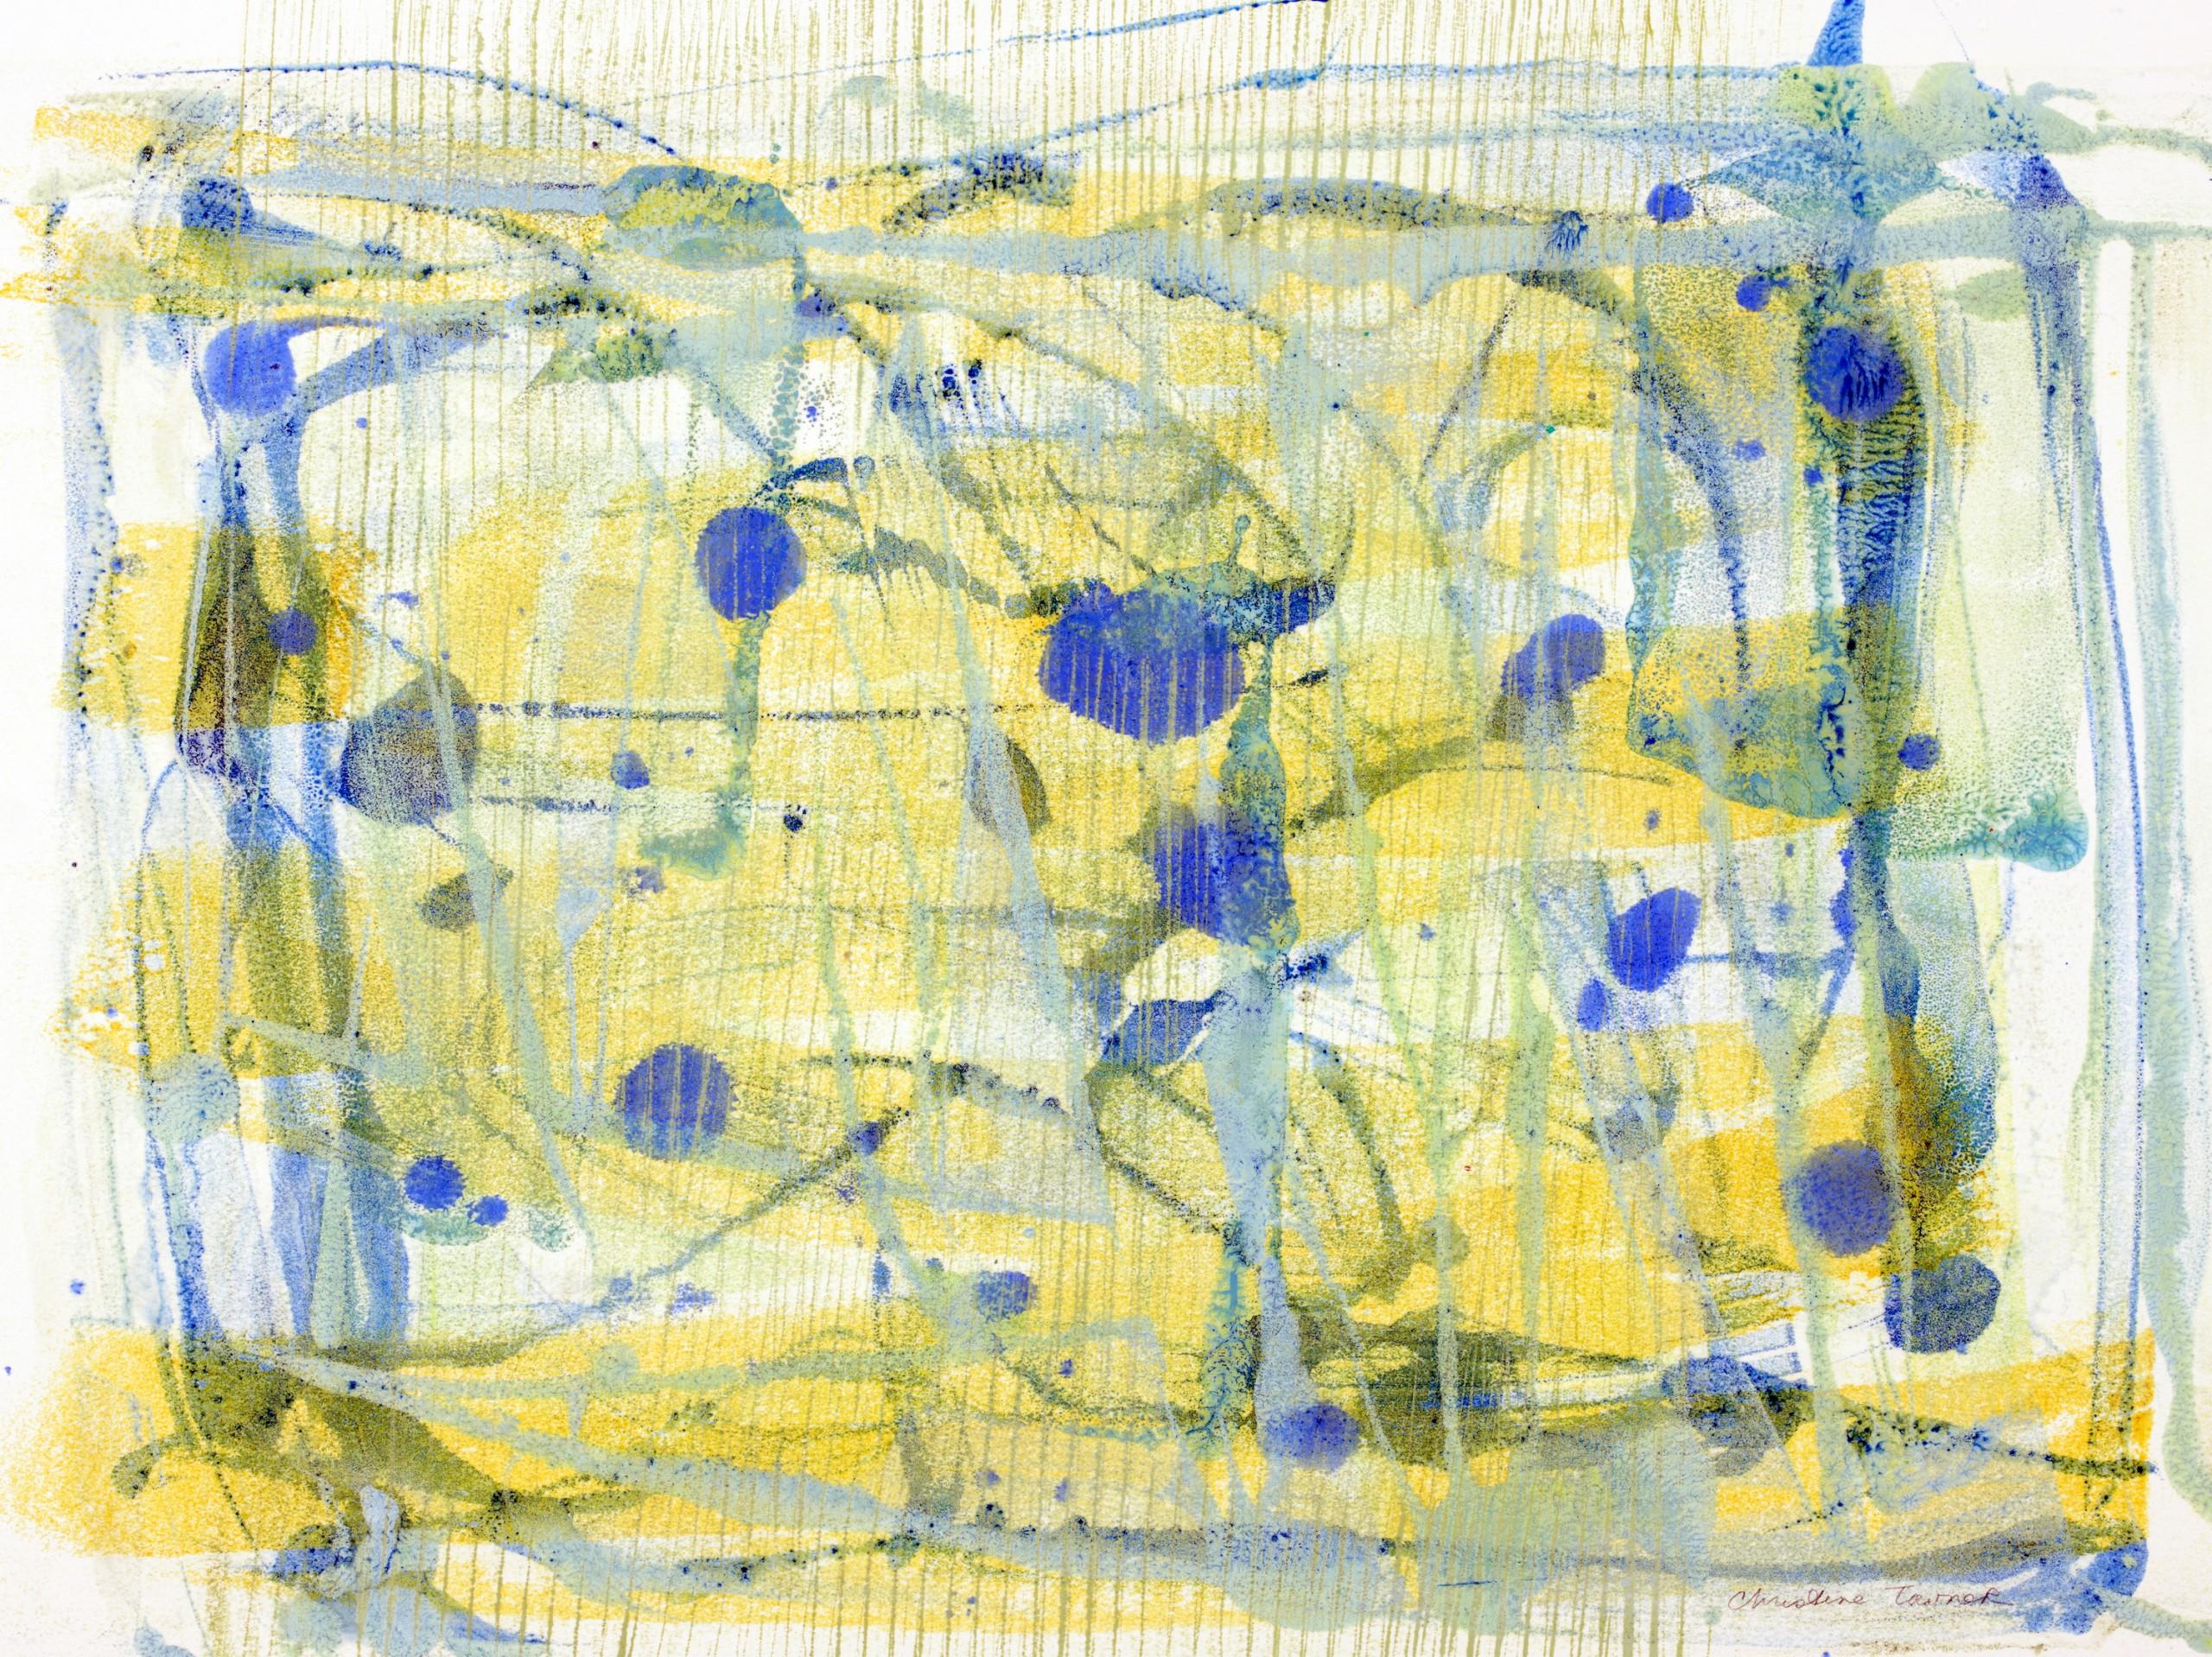 Spring Jubilation, Encaustic on Kozo Paper, 26